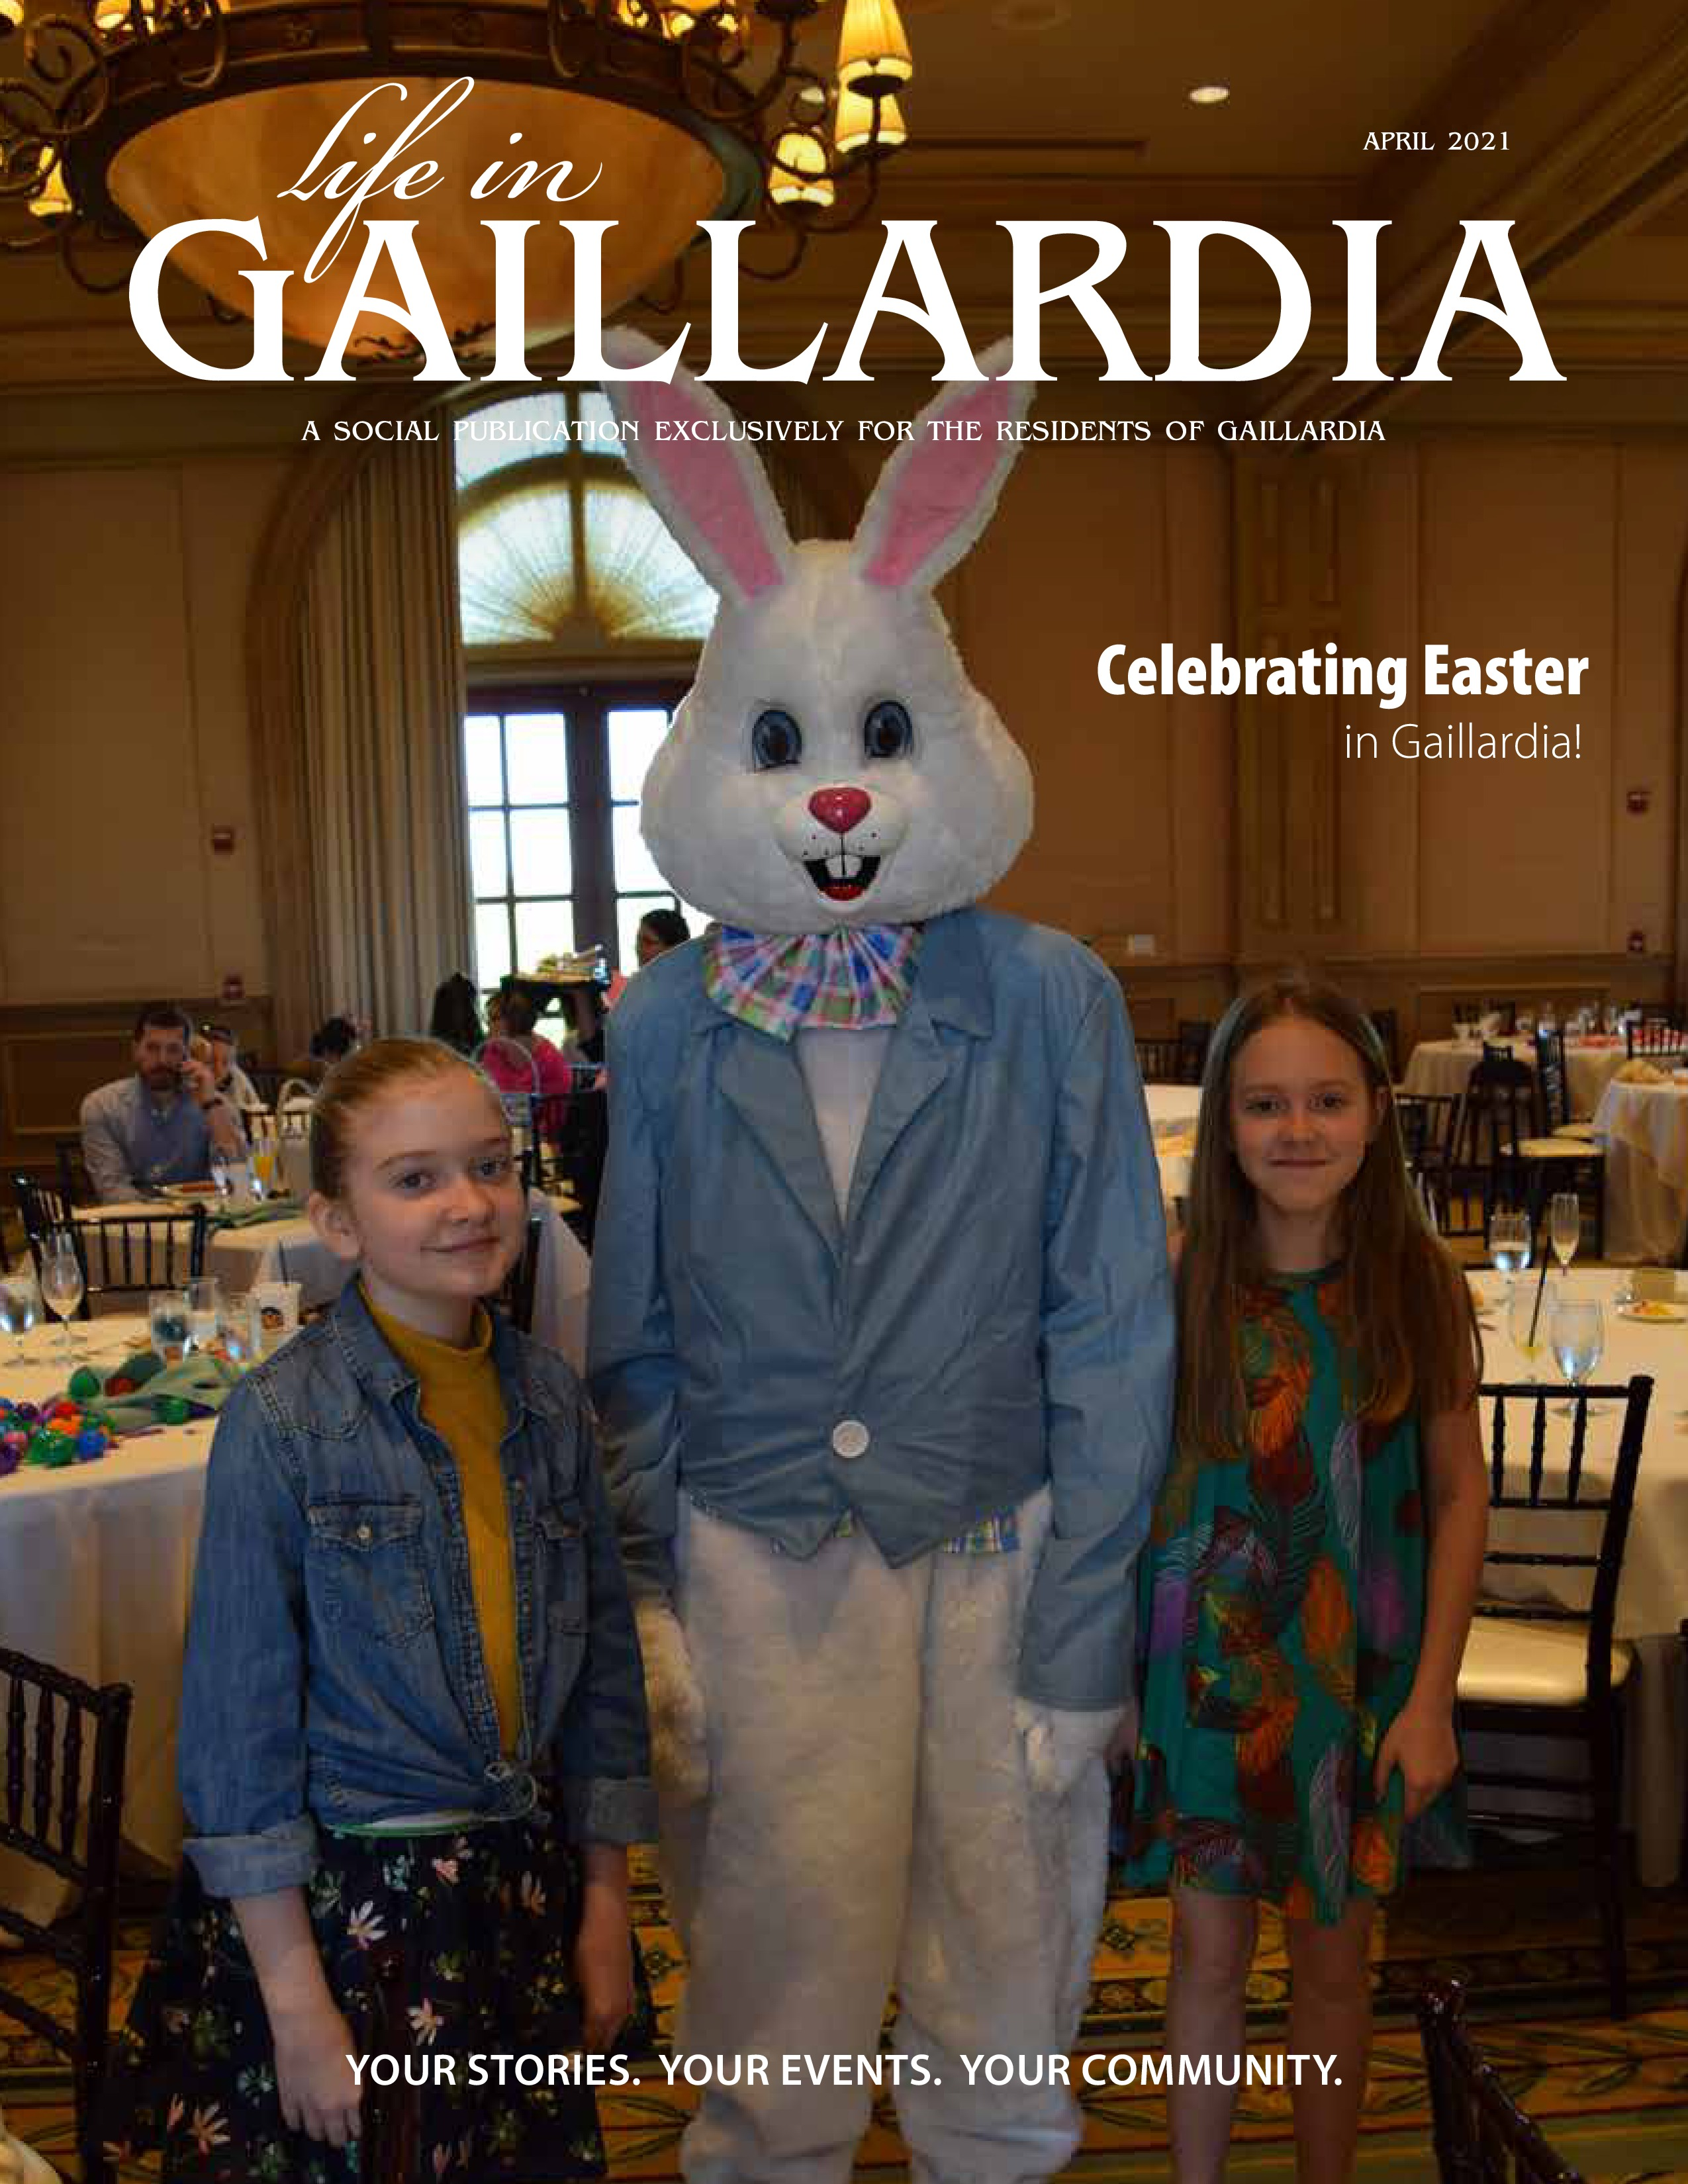 Life in Gaillardia 2021-04-01